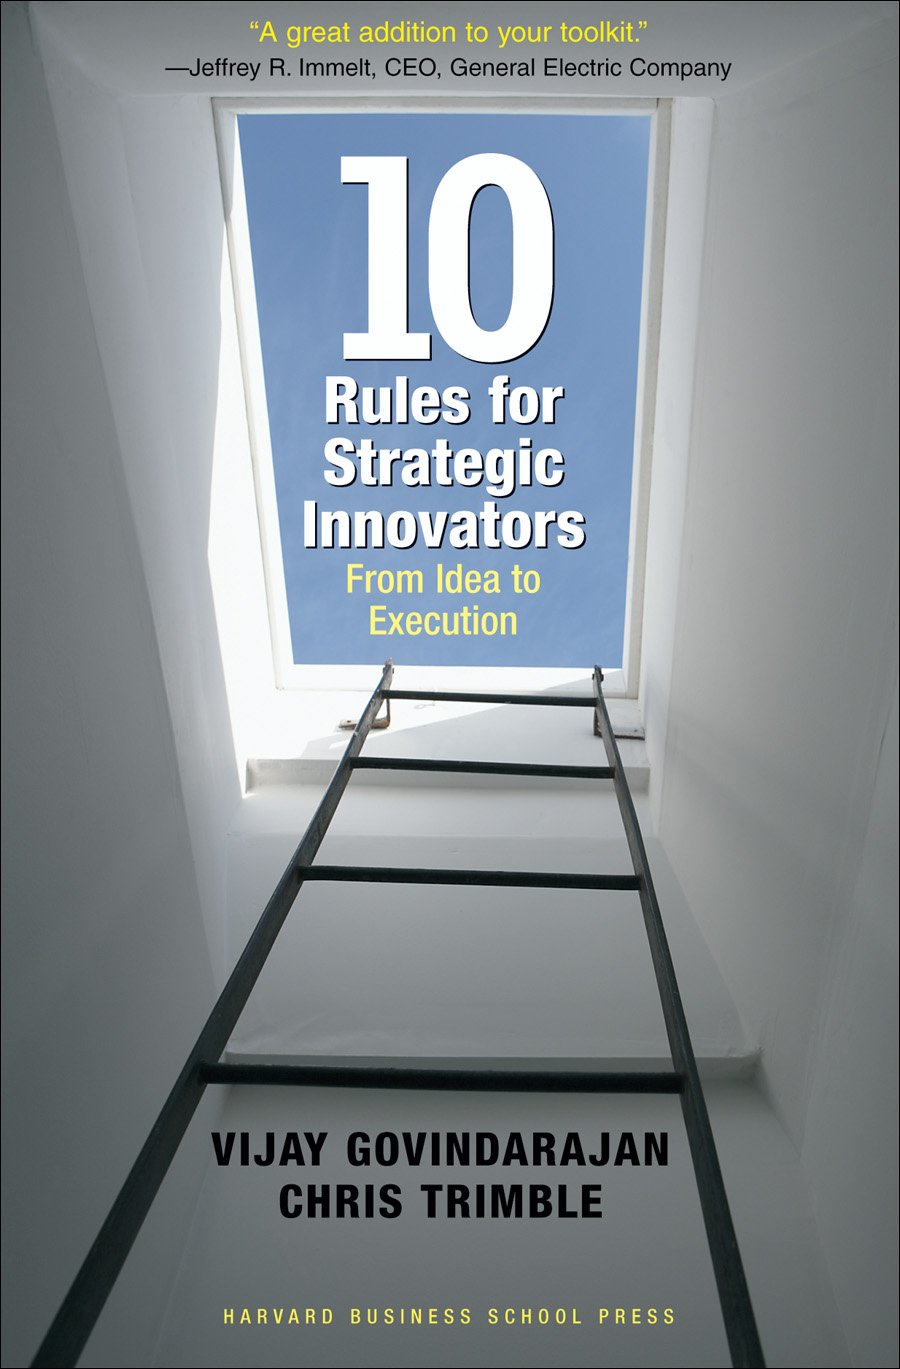 Livro 10 Rules for Strategic Innovators